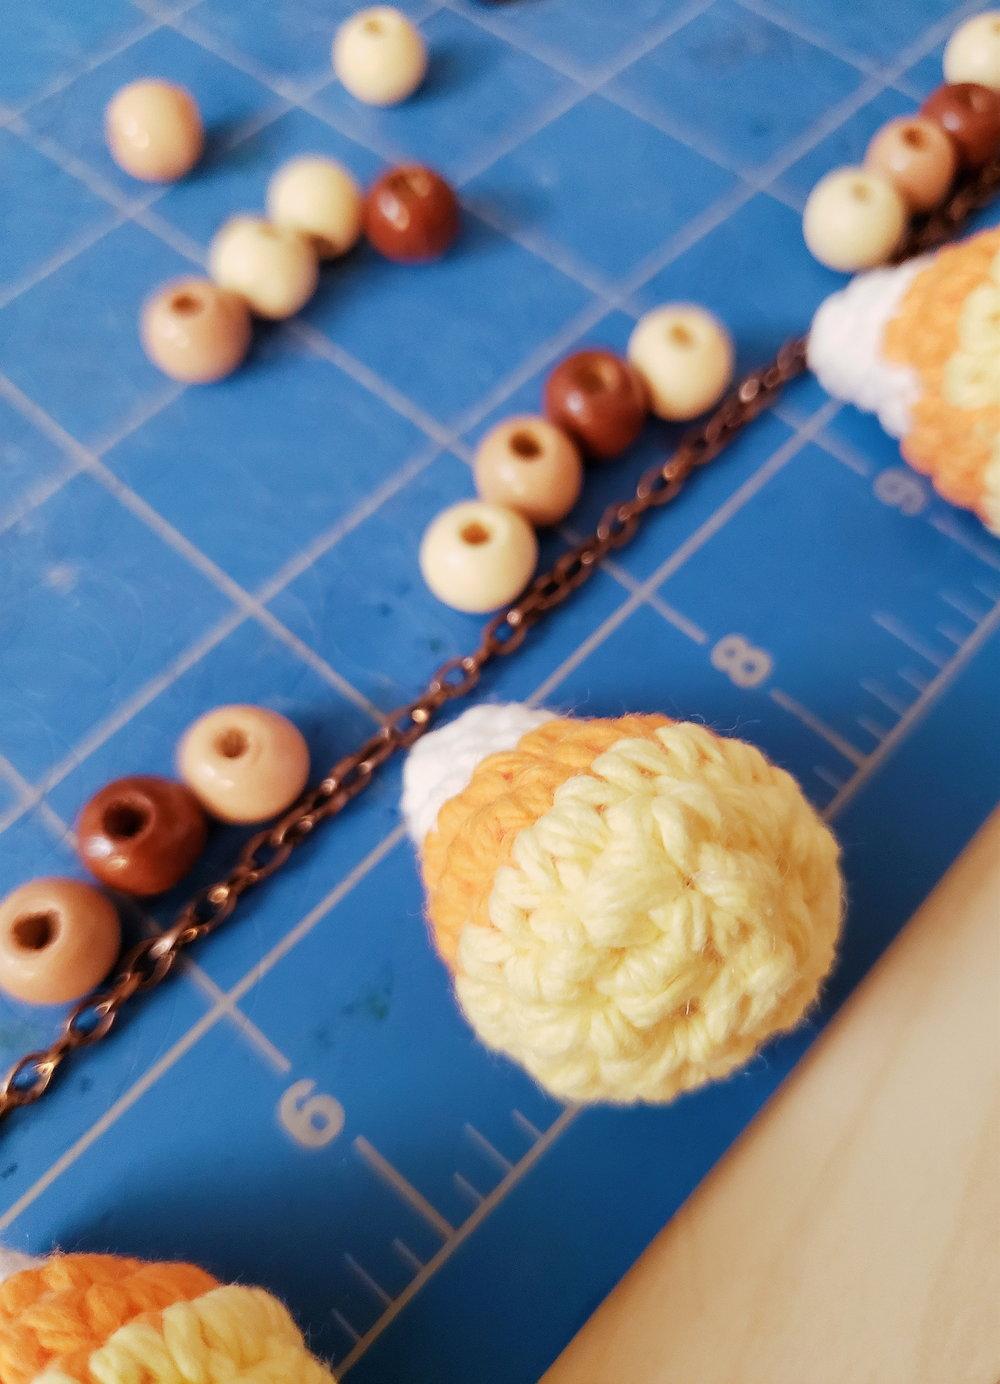 candy corn crochet pattern